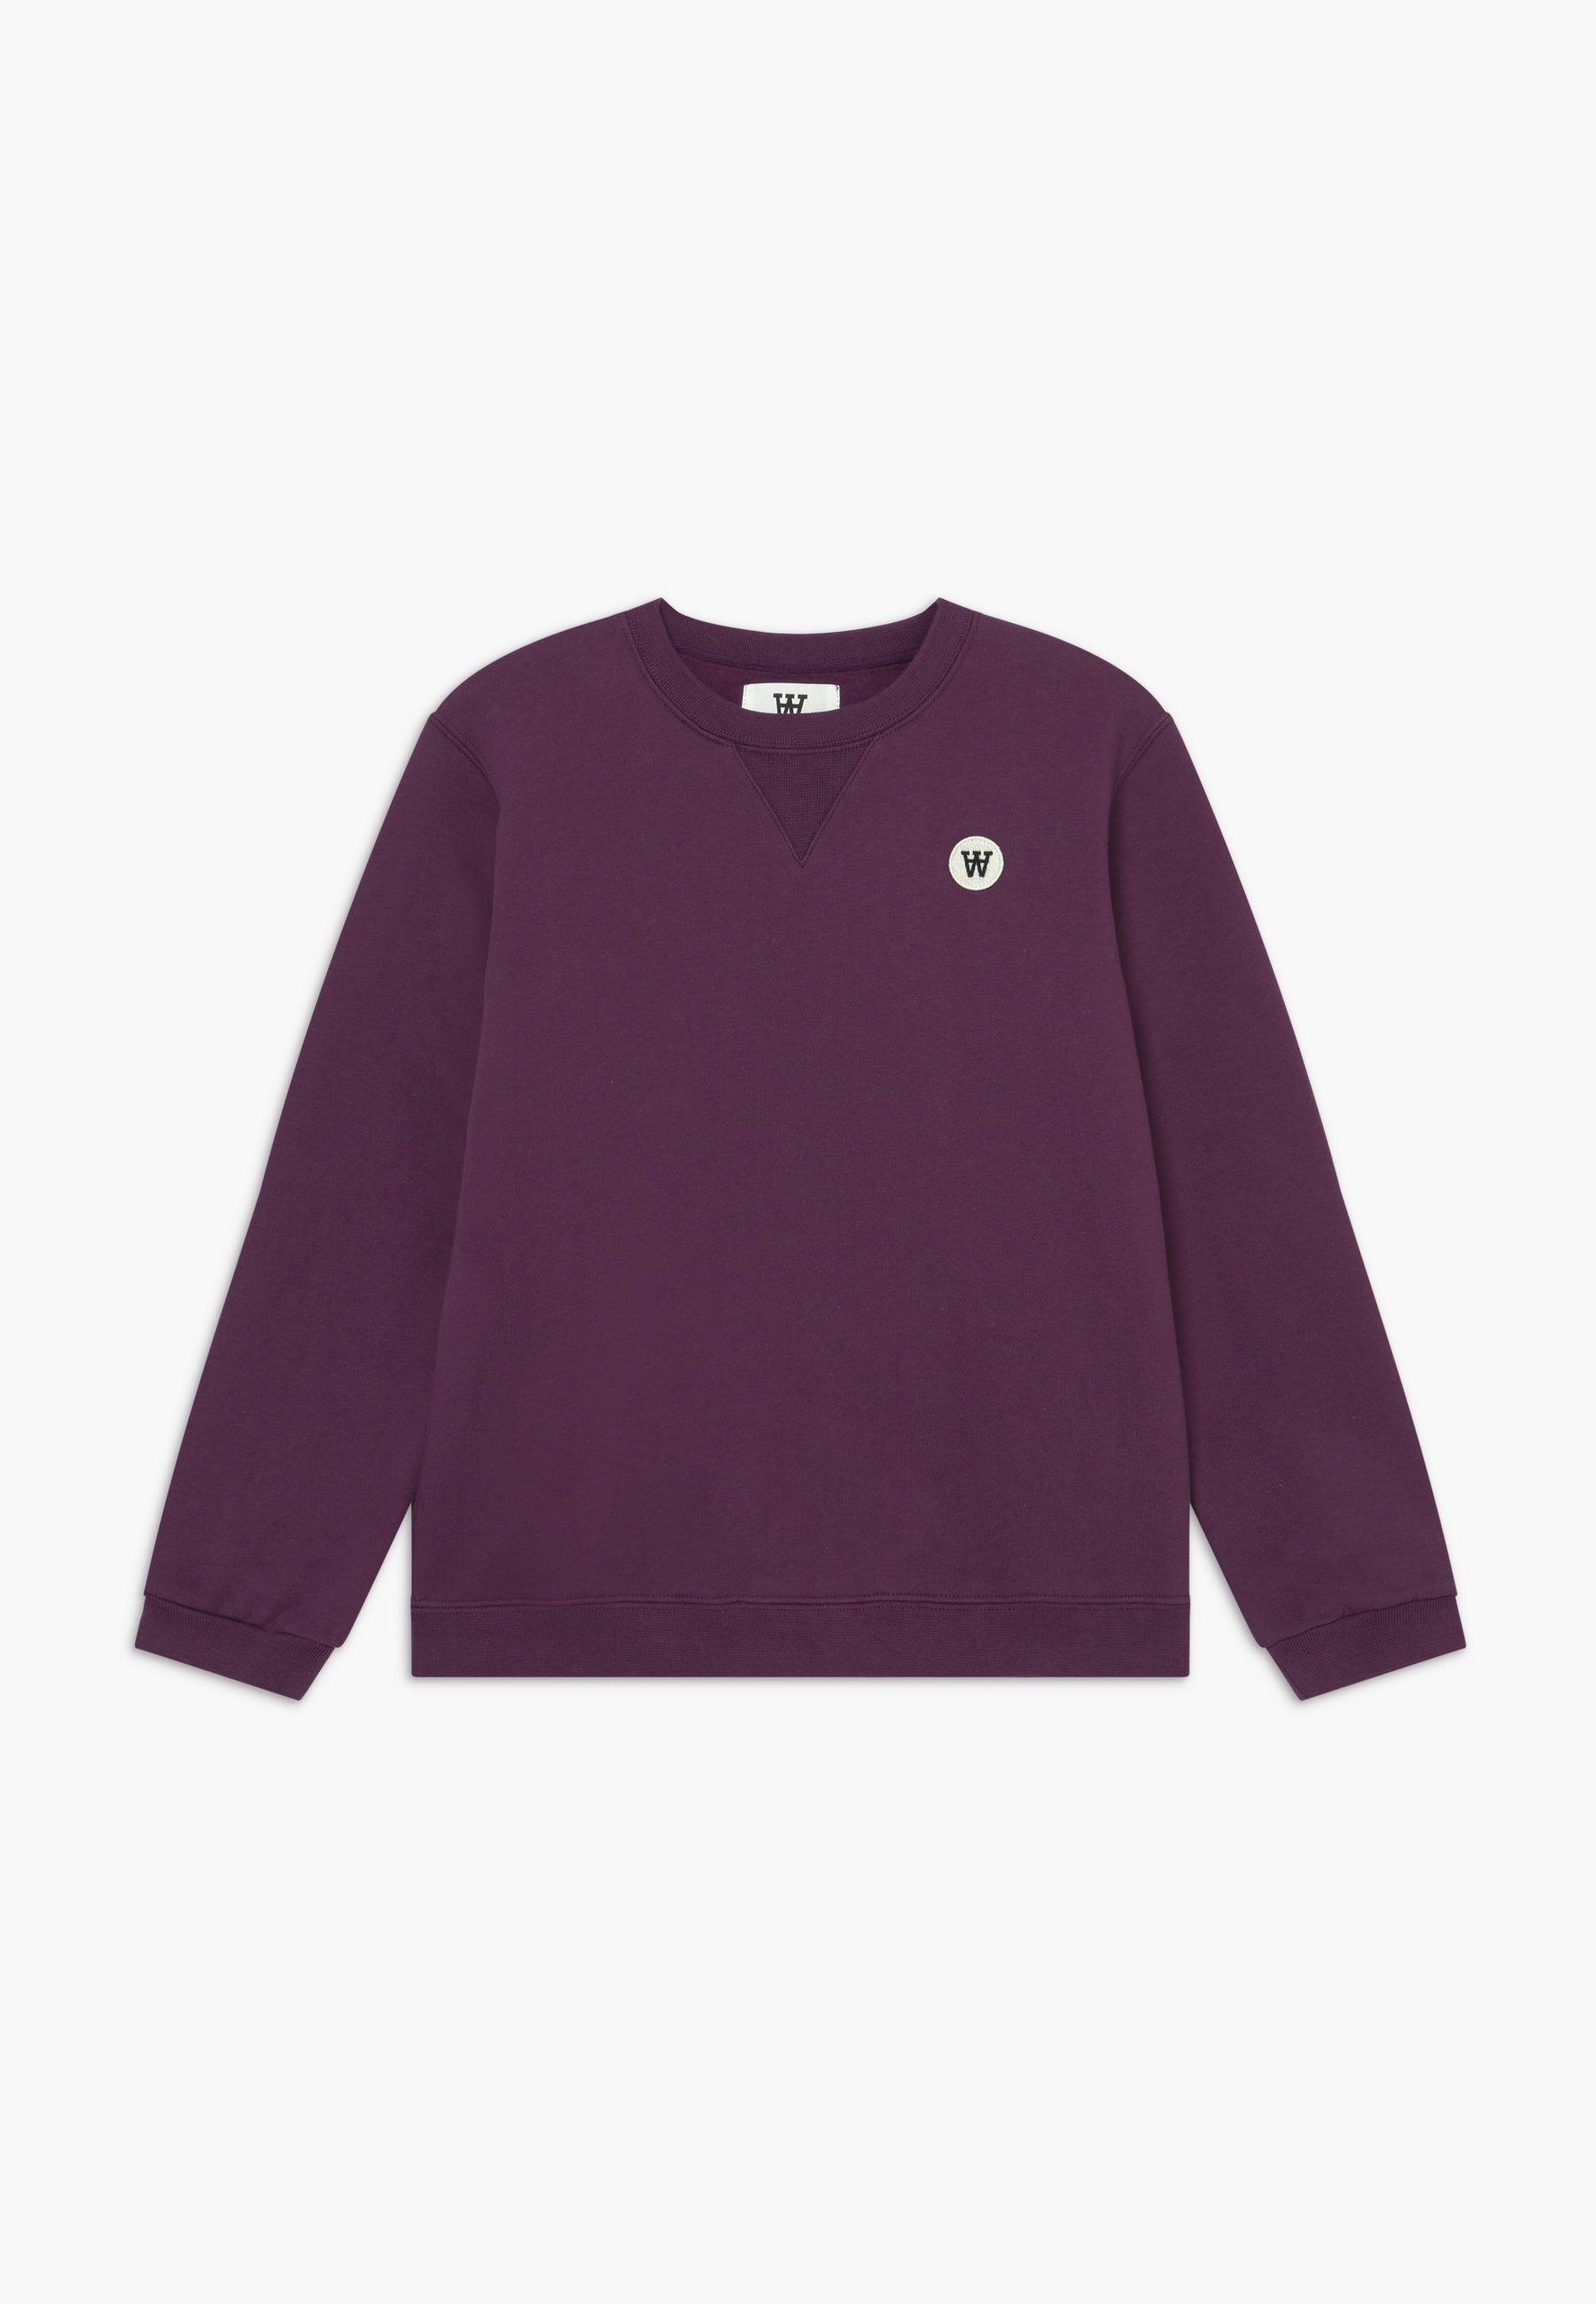 Große Förderung Wood Wood ROD KIDS - Sweatshirt - aubergine | Damenbekleidung 2020